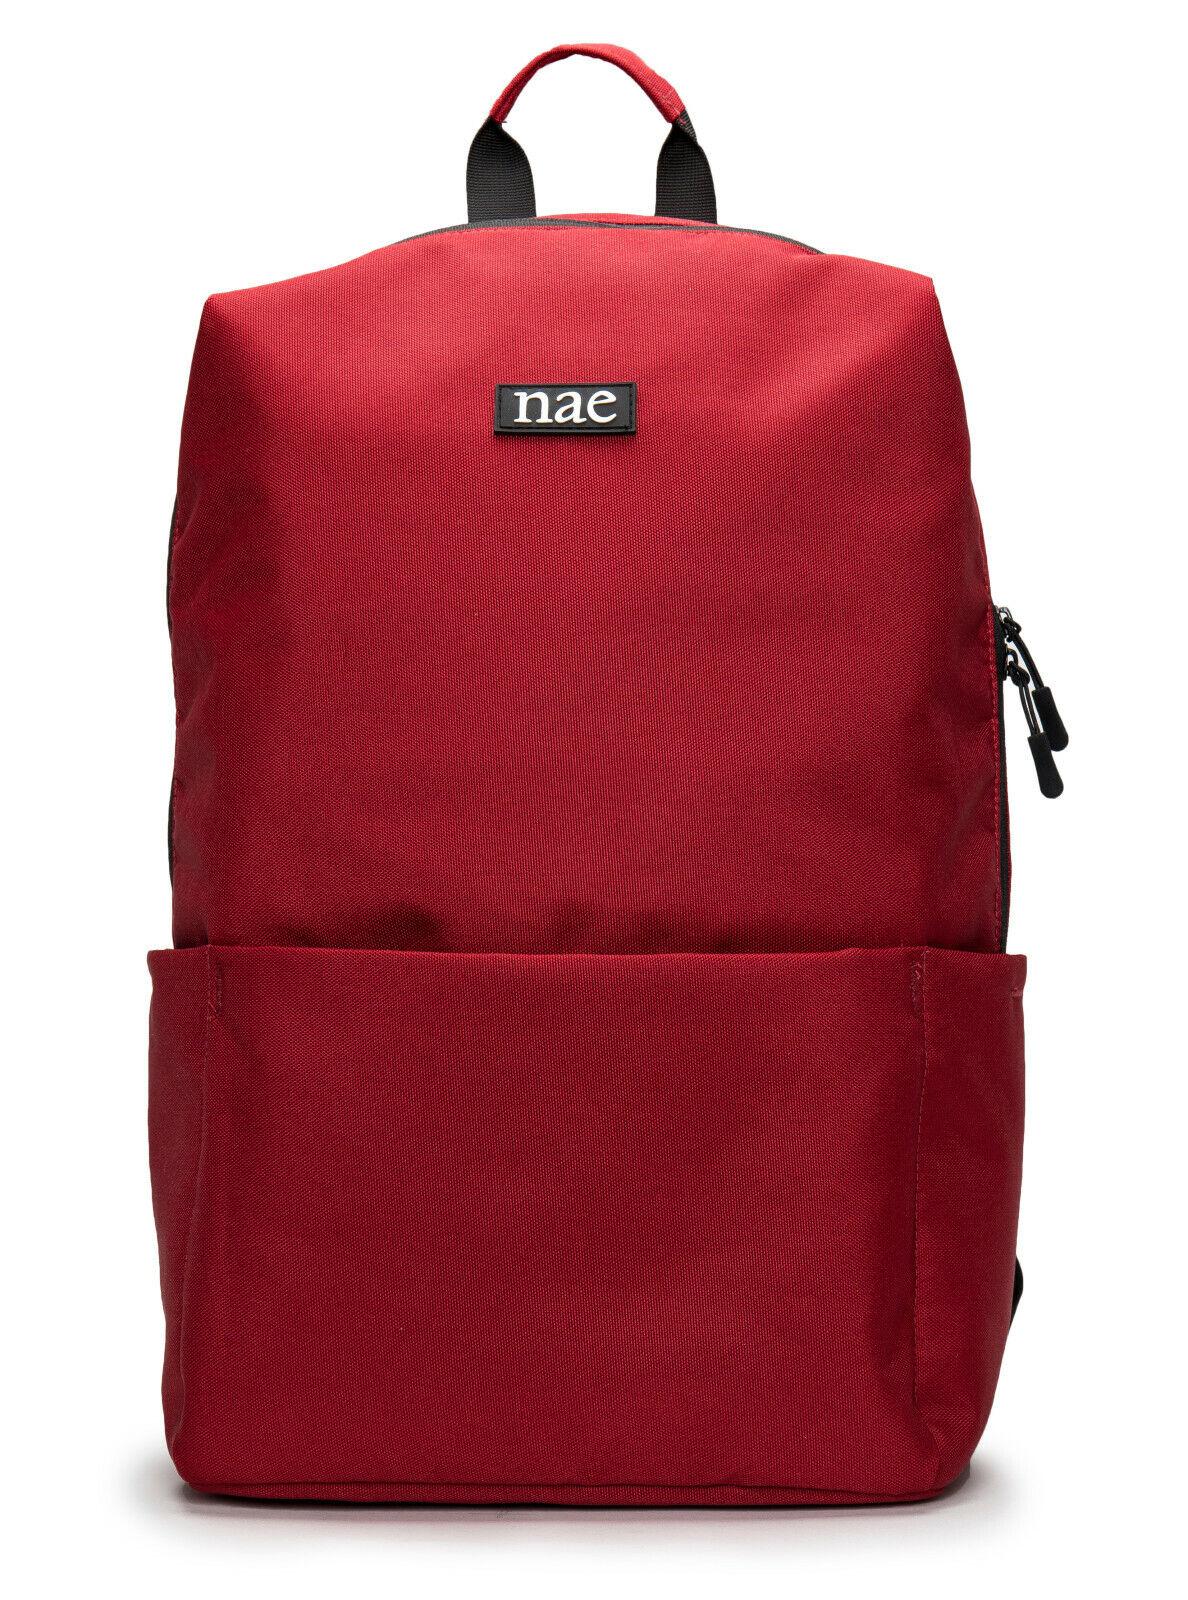 Shoulder vegan backpack on recycled PET resistant with laptop sleeve pocket zip